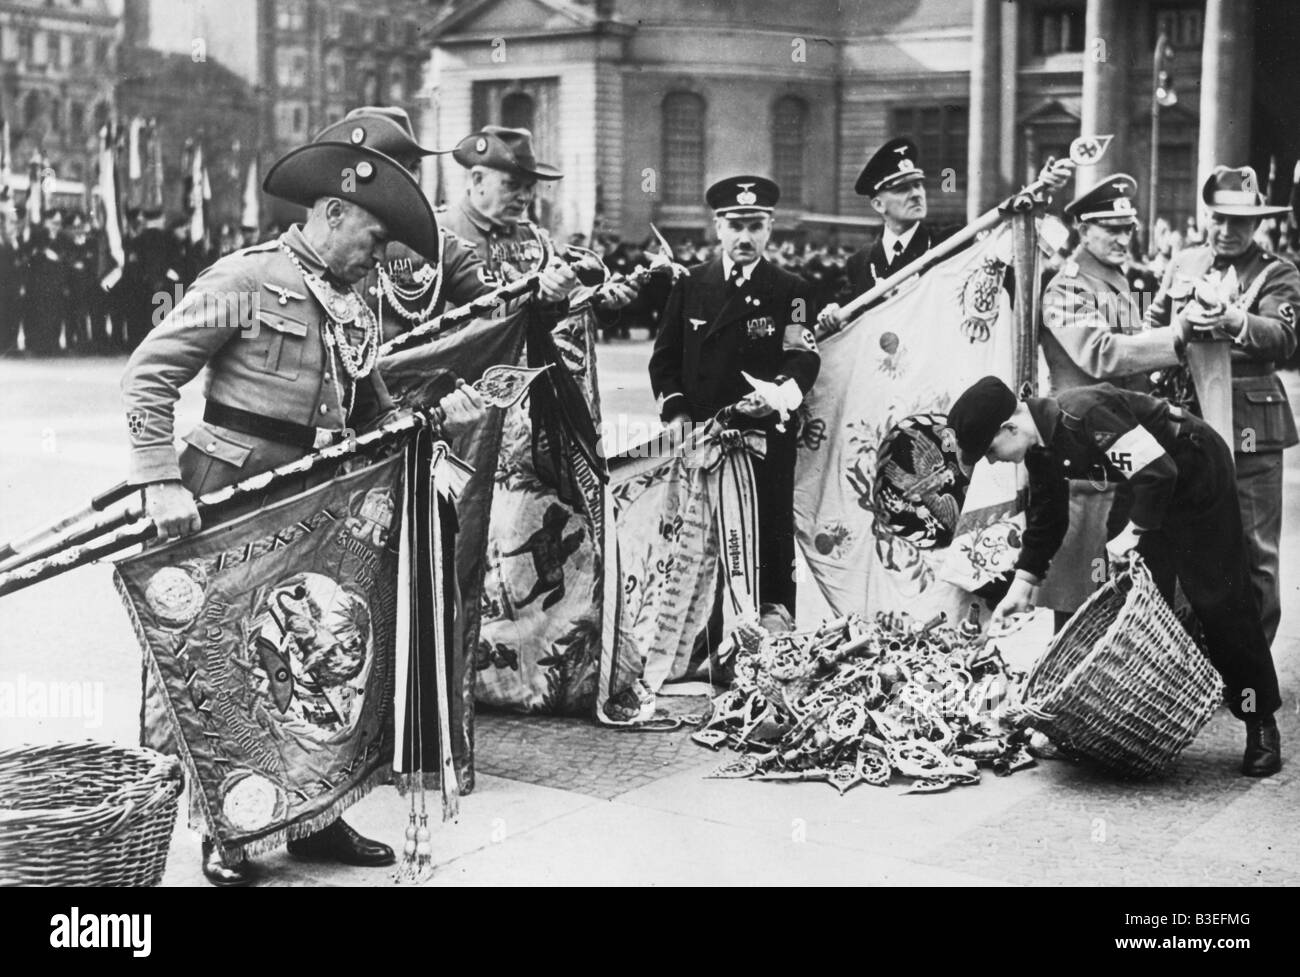 Metal donations / Berlin / 1940 - Stock Image